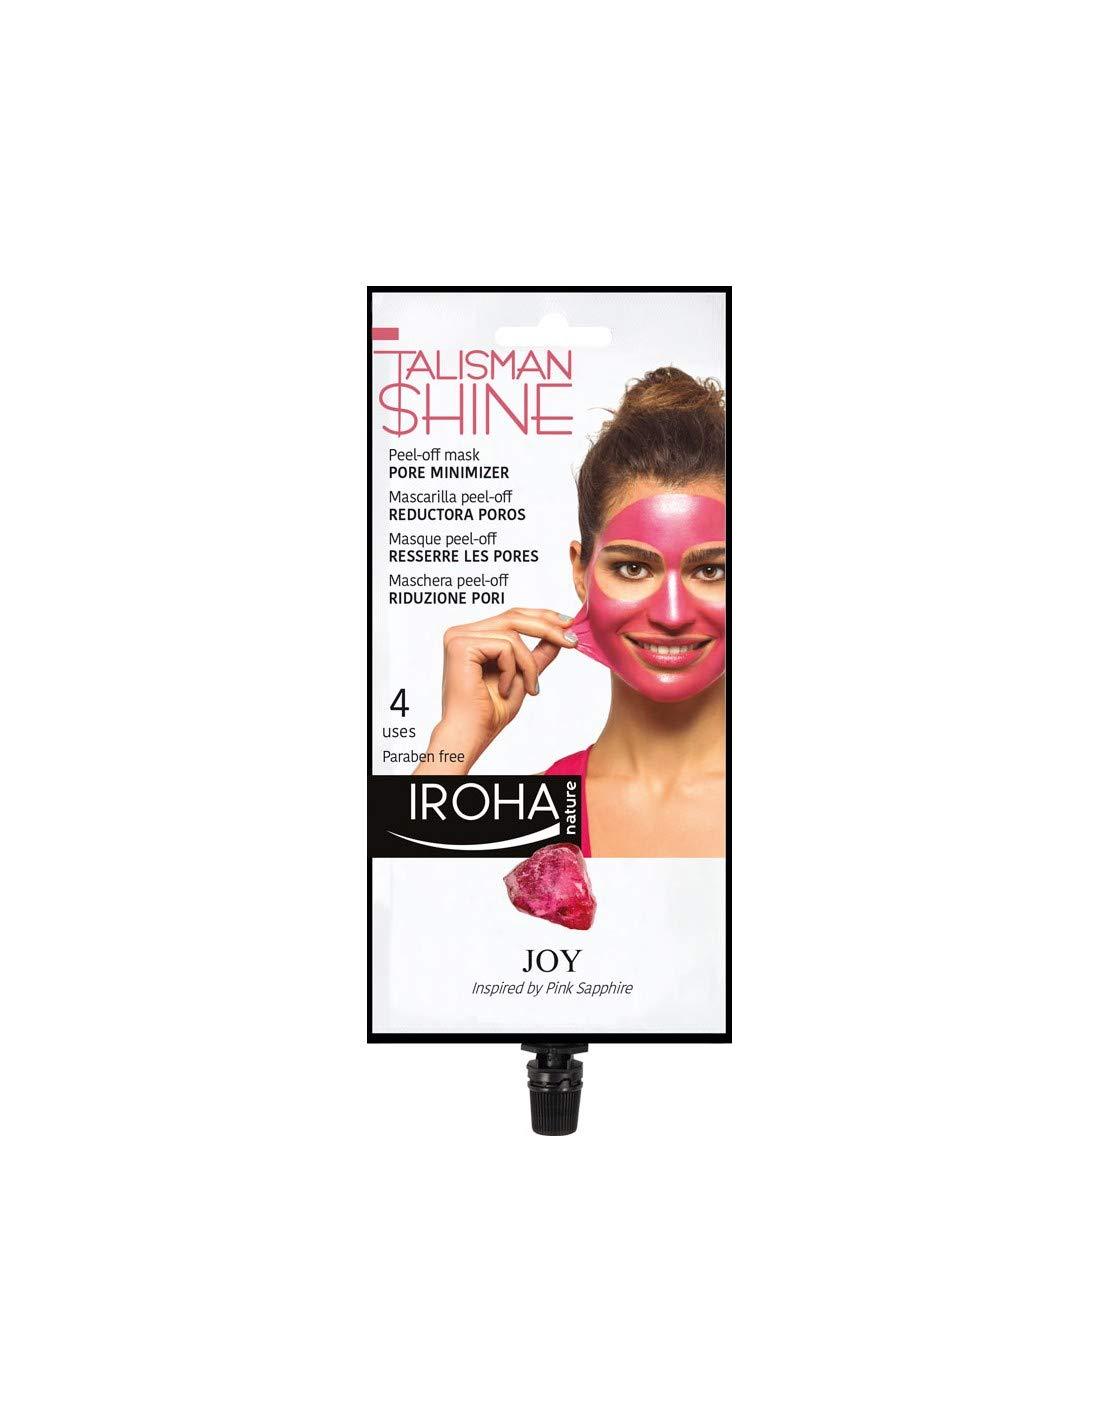 Iroha Nature - Mascarilla Facial Peel Off Rosa, Talisman Shine, Reductora de Poros con Uva y Pomelo, 4 usos 1packs   Mascarilla Peel-Off Poros